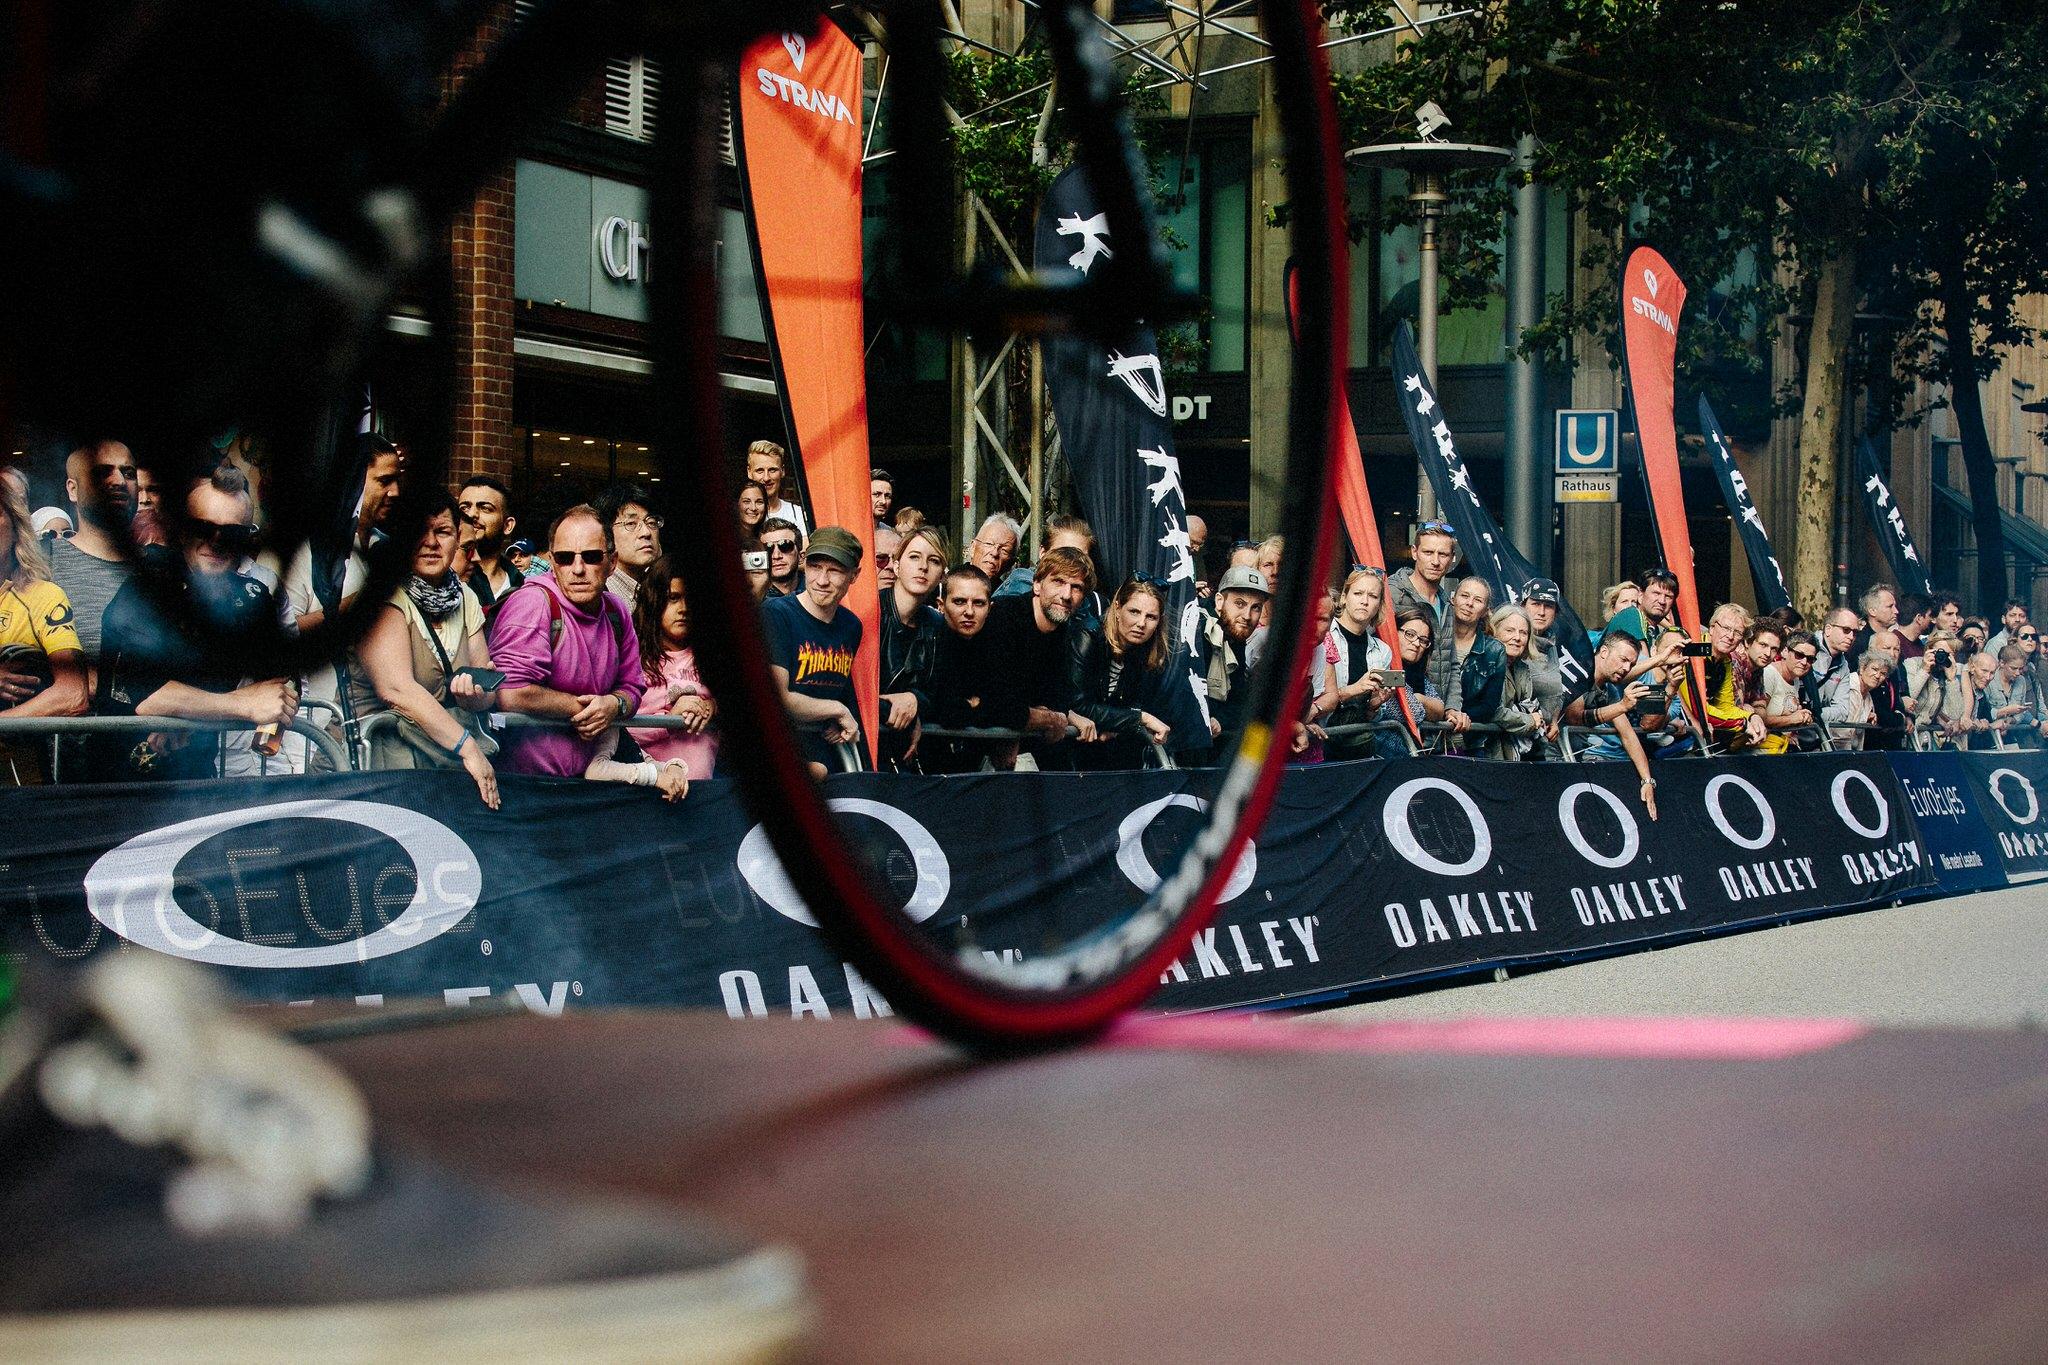 RAD-RACE_BATTLE_Cyclassics_2017_Photo by Björn Lexius_07.jpg